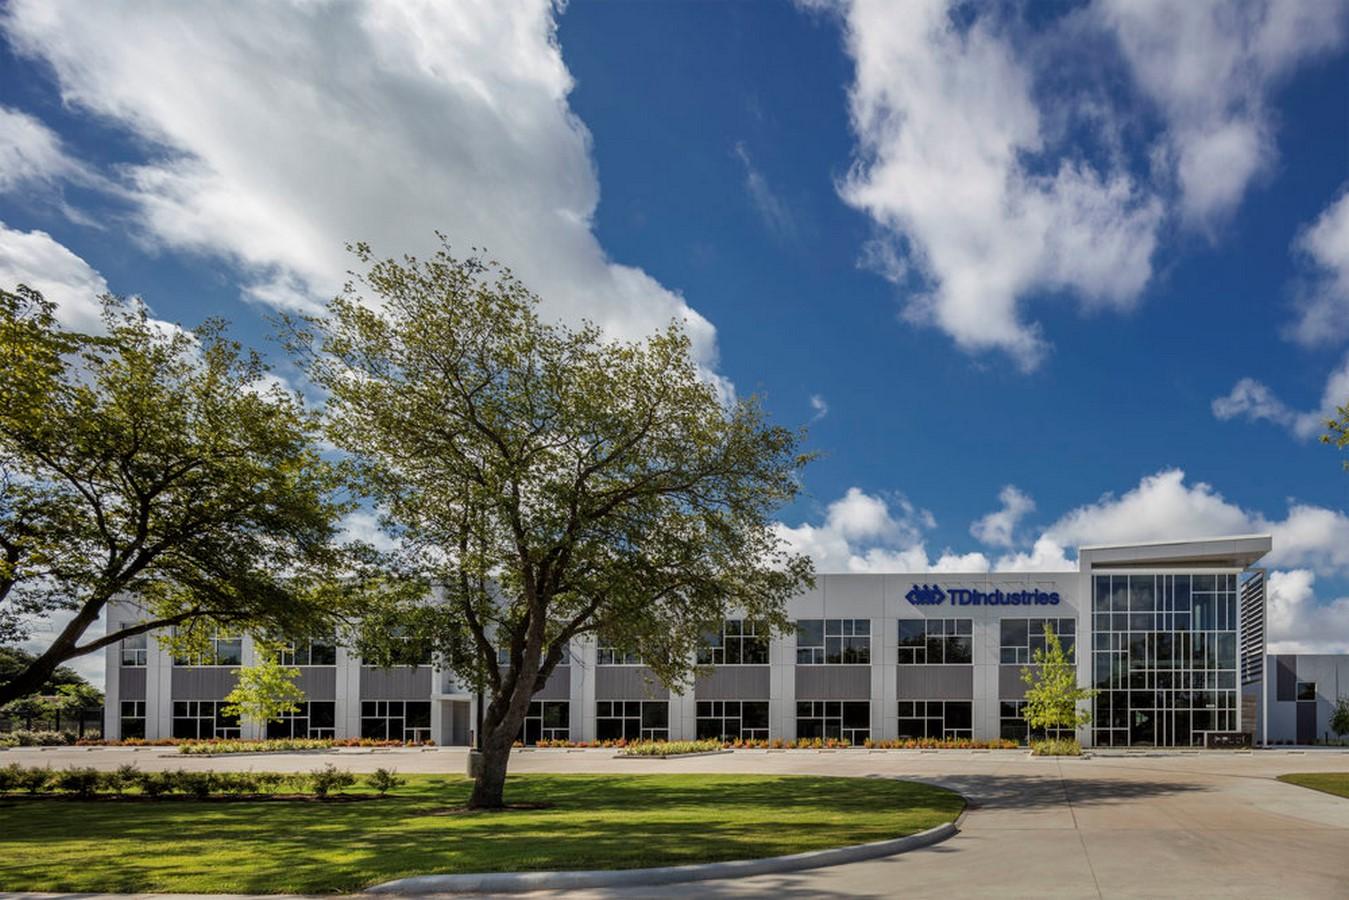 TD Industries Regional Office - Sheet3